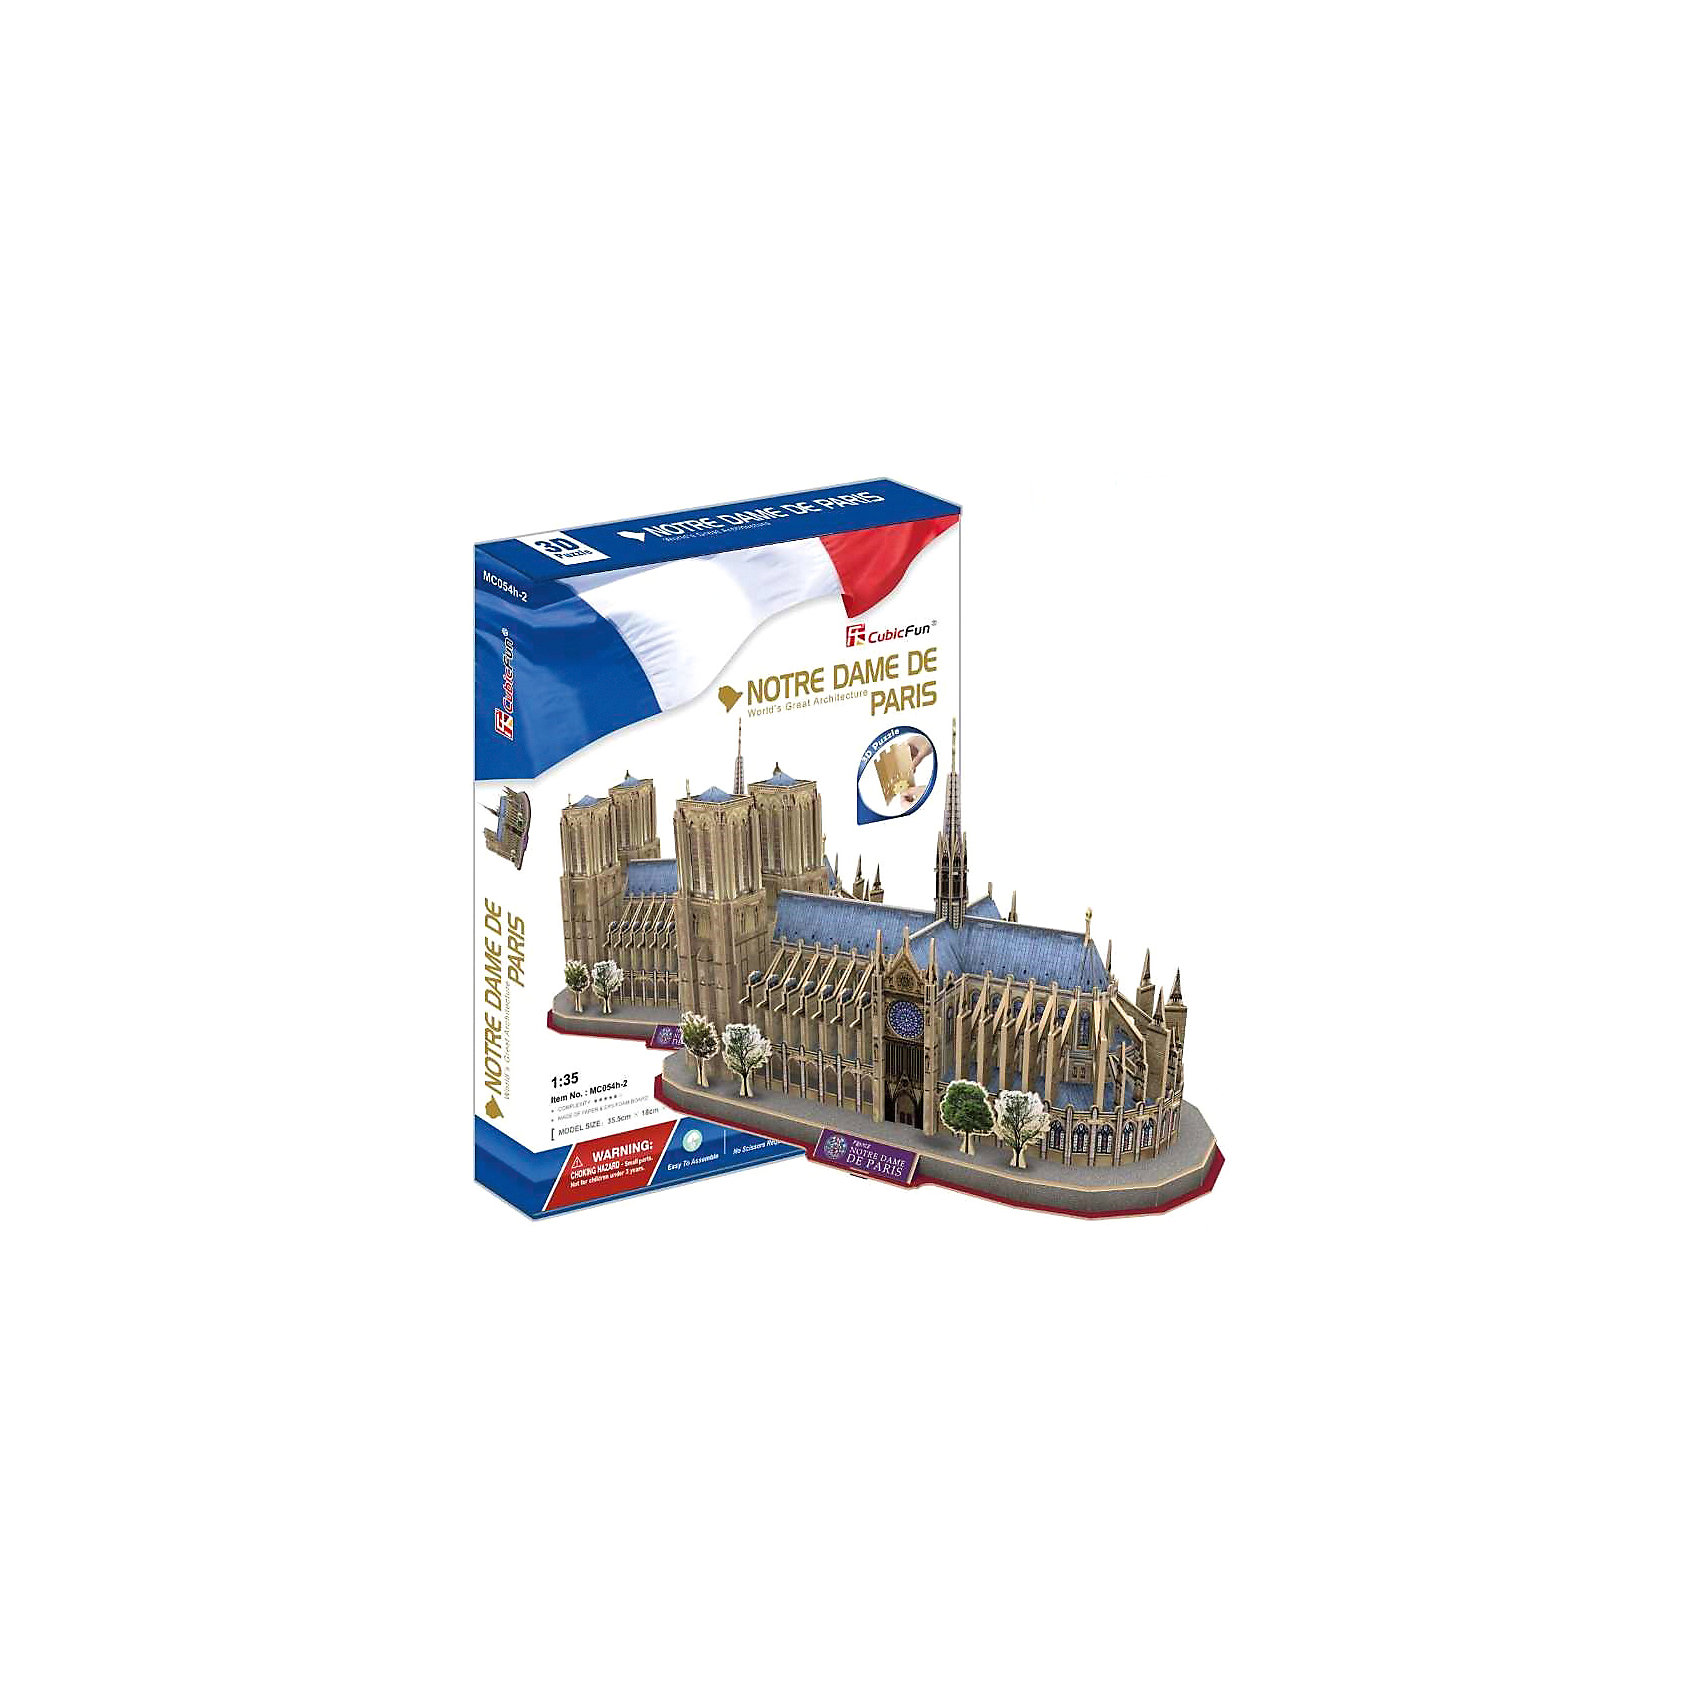 CubicFun Пазл 3D Нотердам де Пари (Франция), CubicFun конструкторы cubicfun 3d пазл эйфелева башня 2 франция